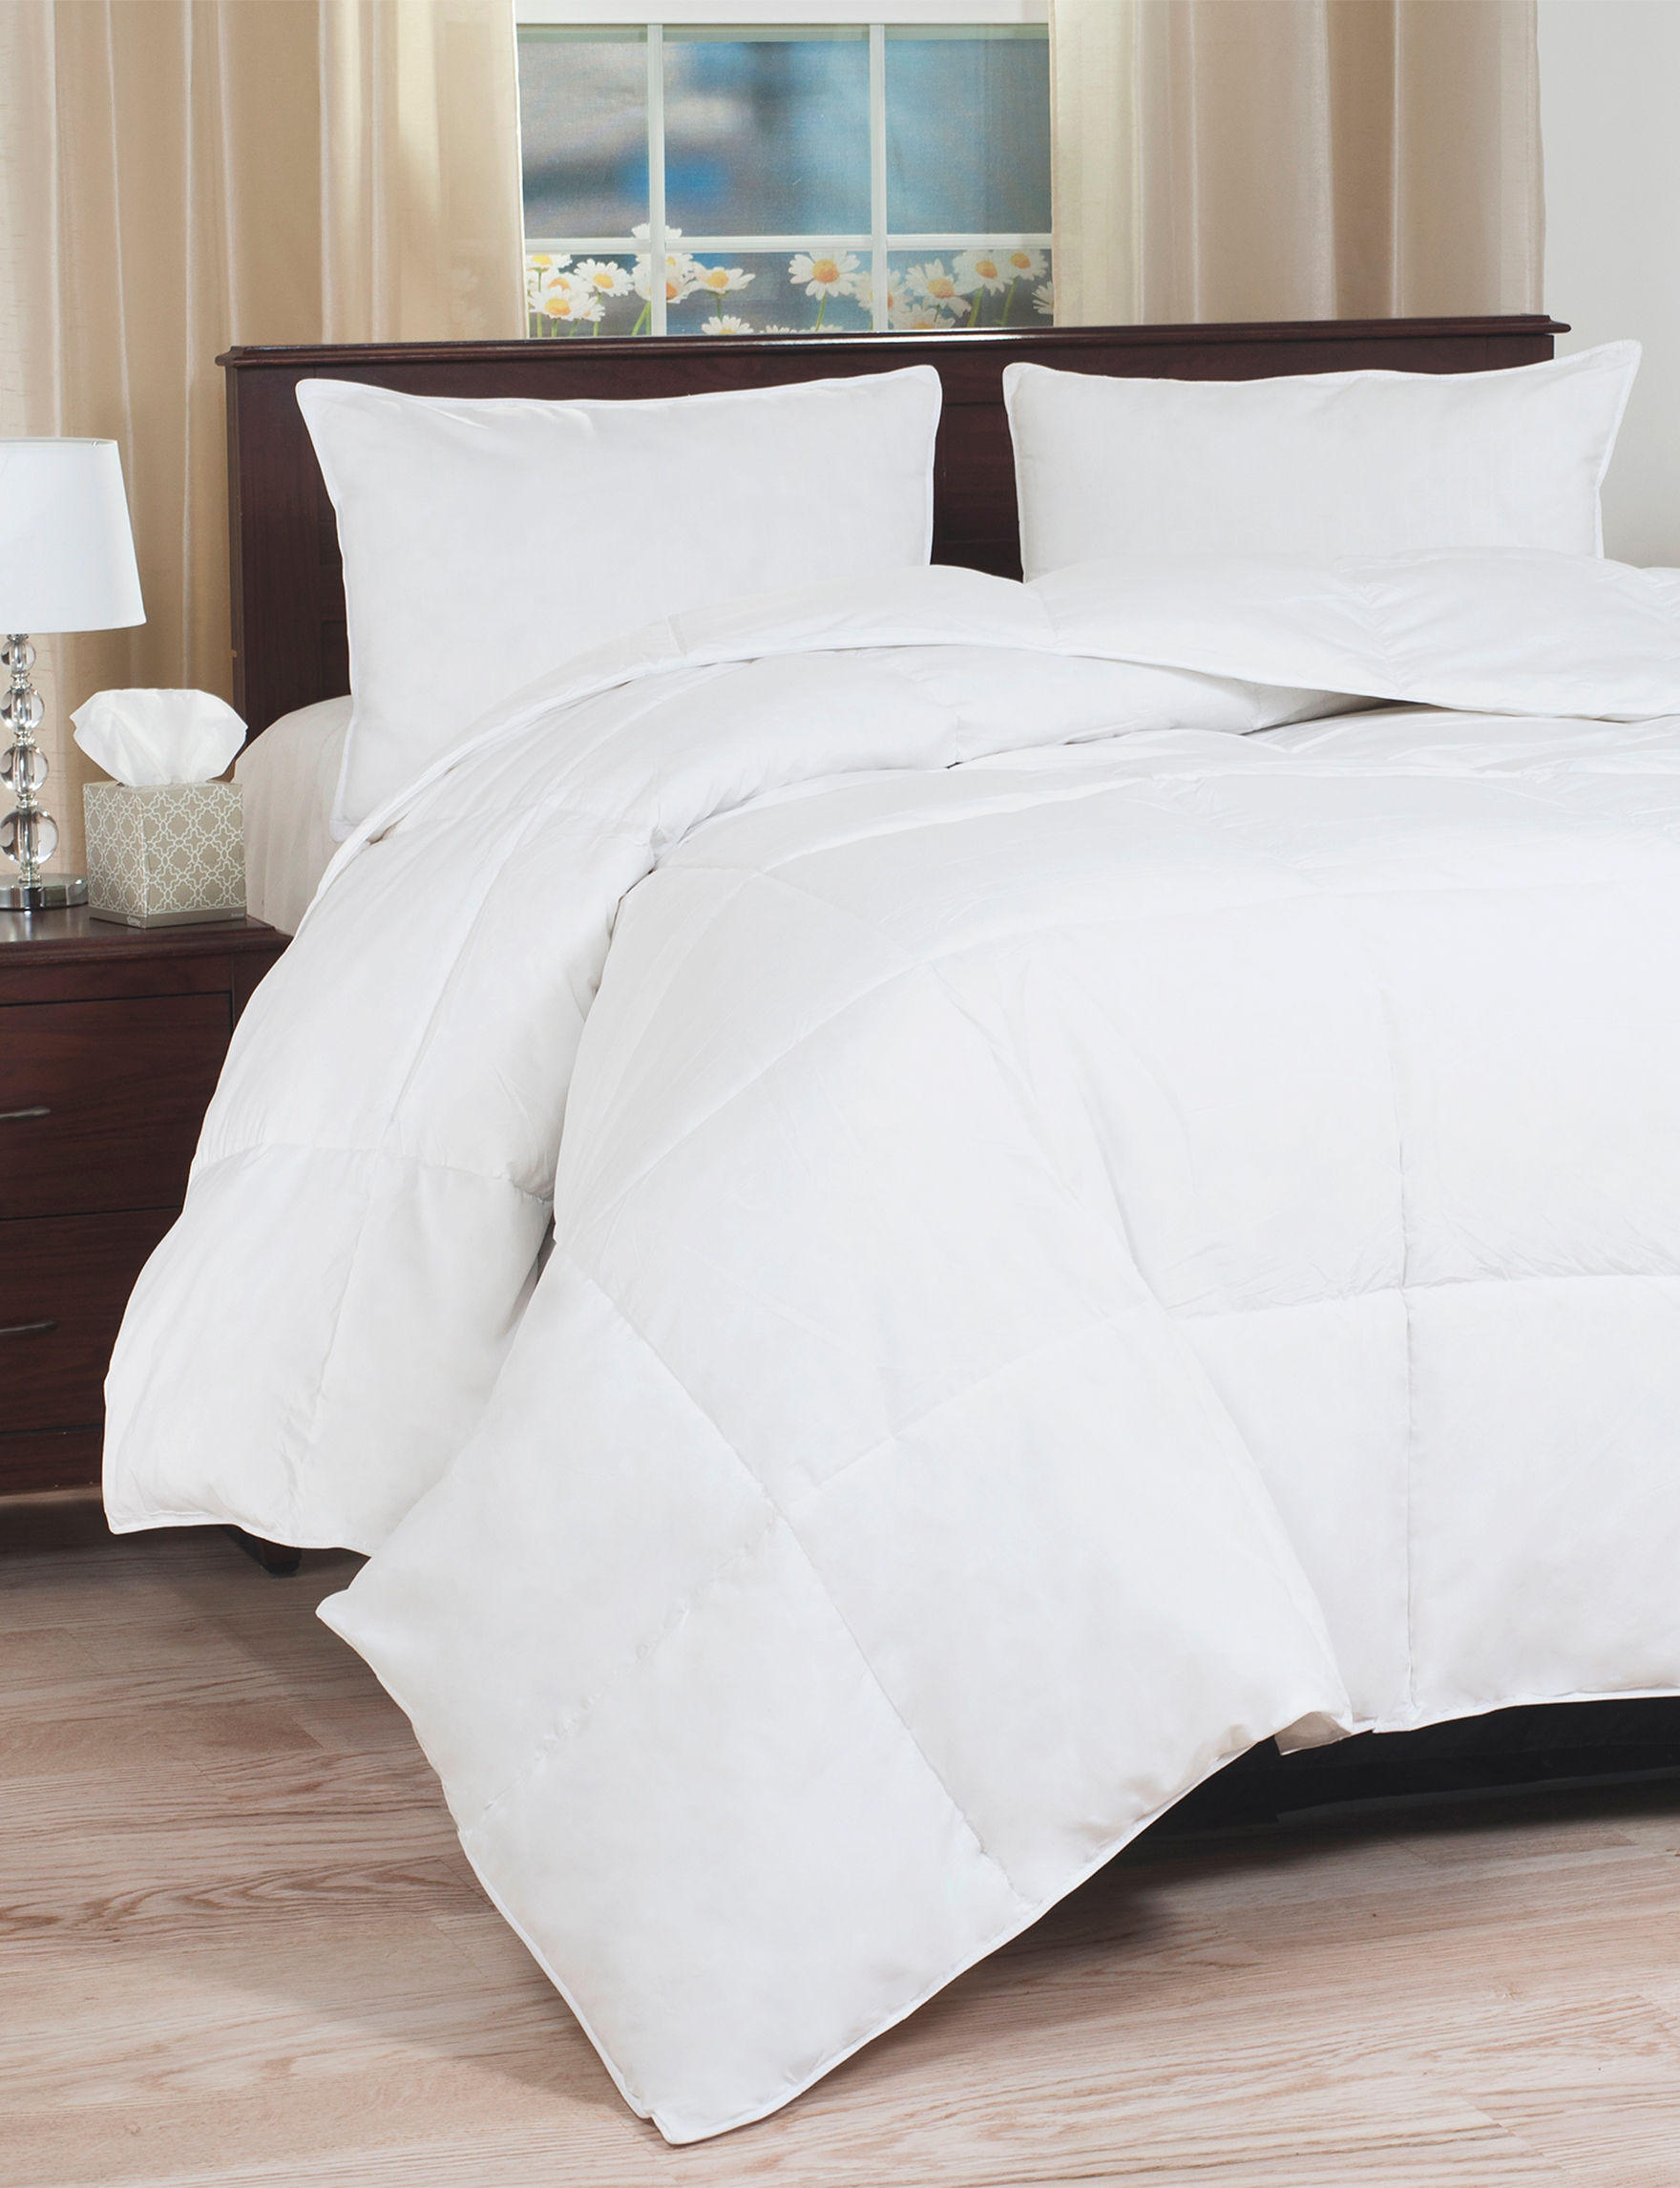 Lavish Home White Comforters & Comforter Sets